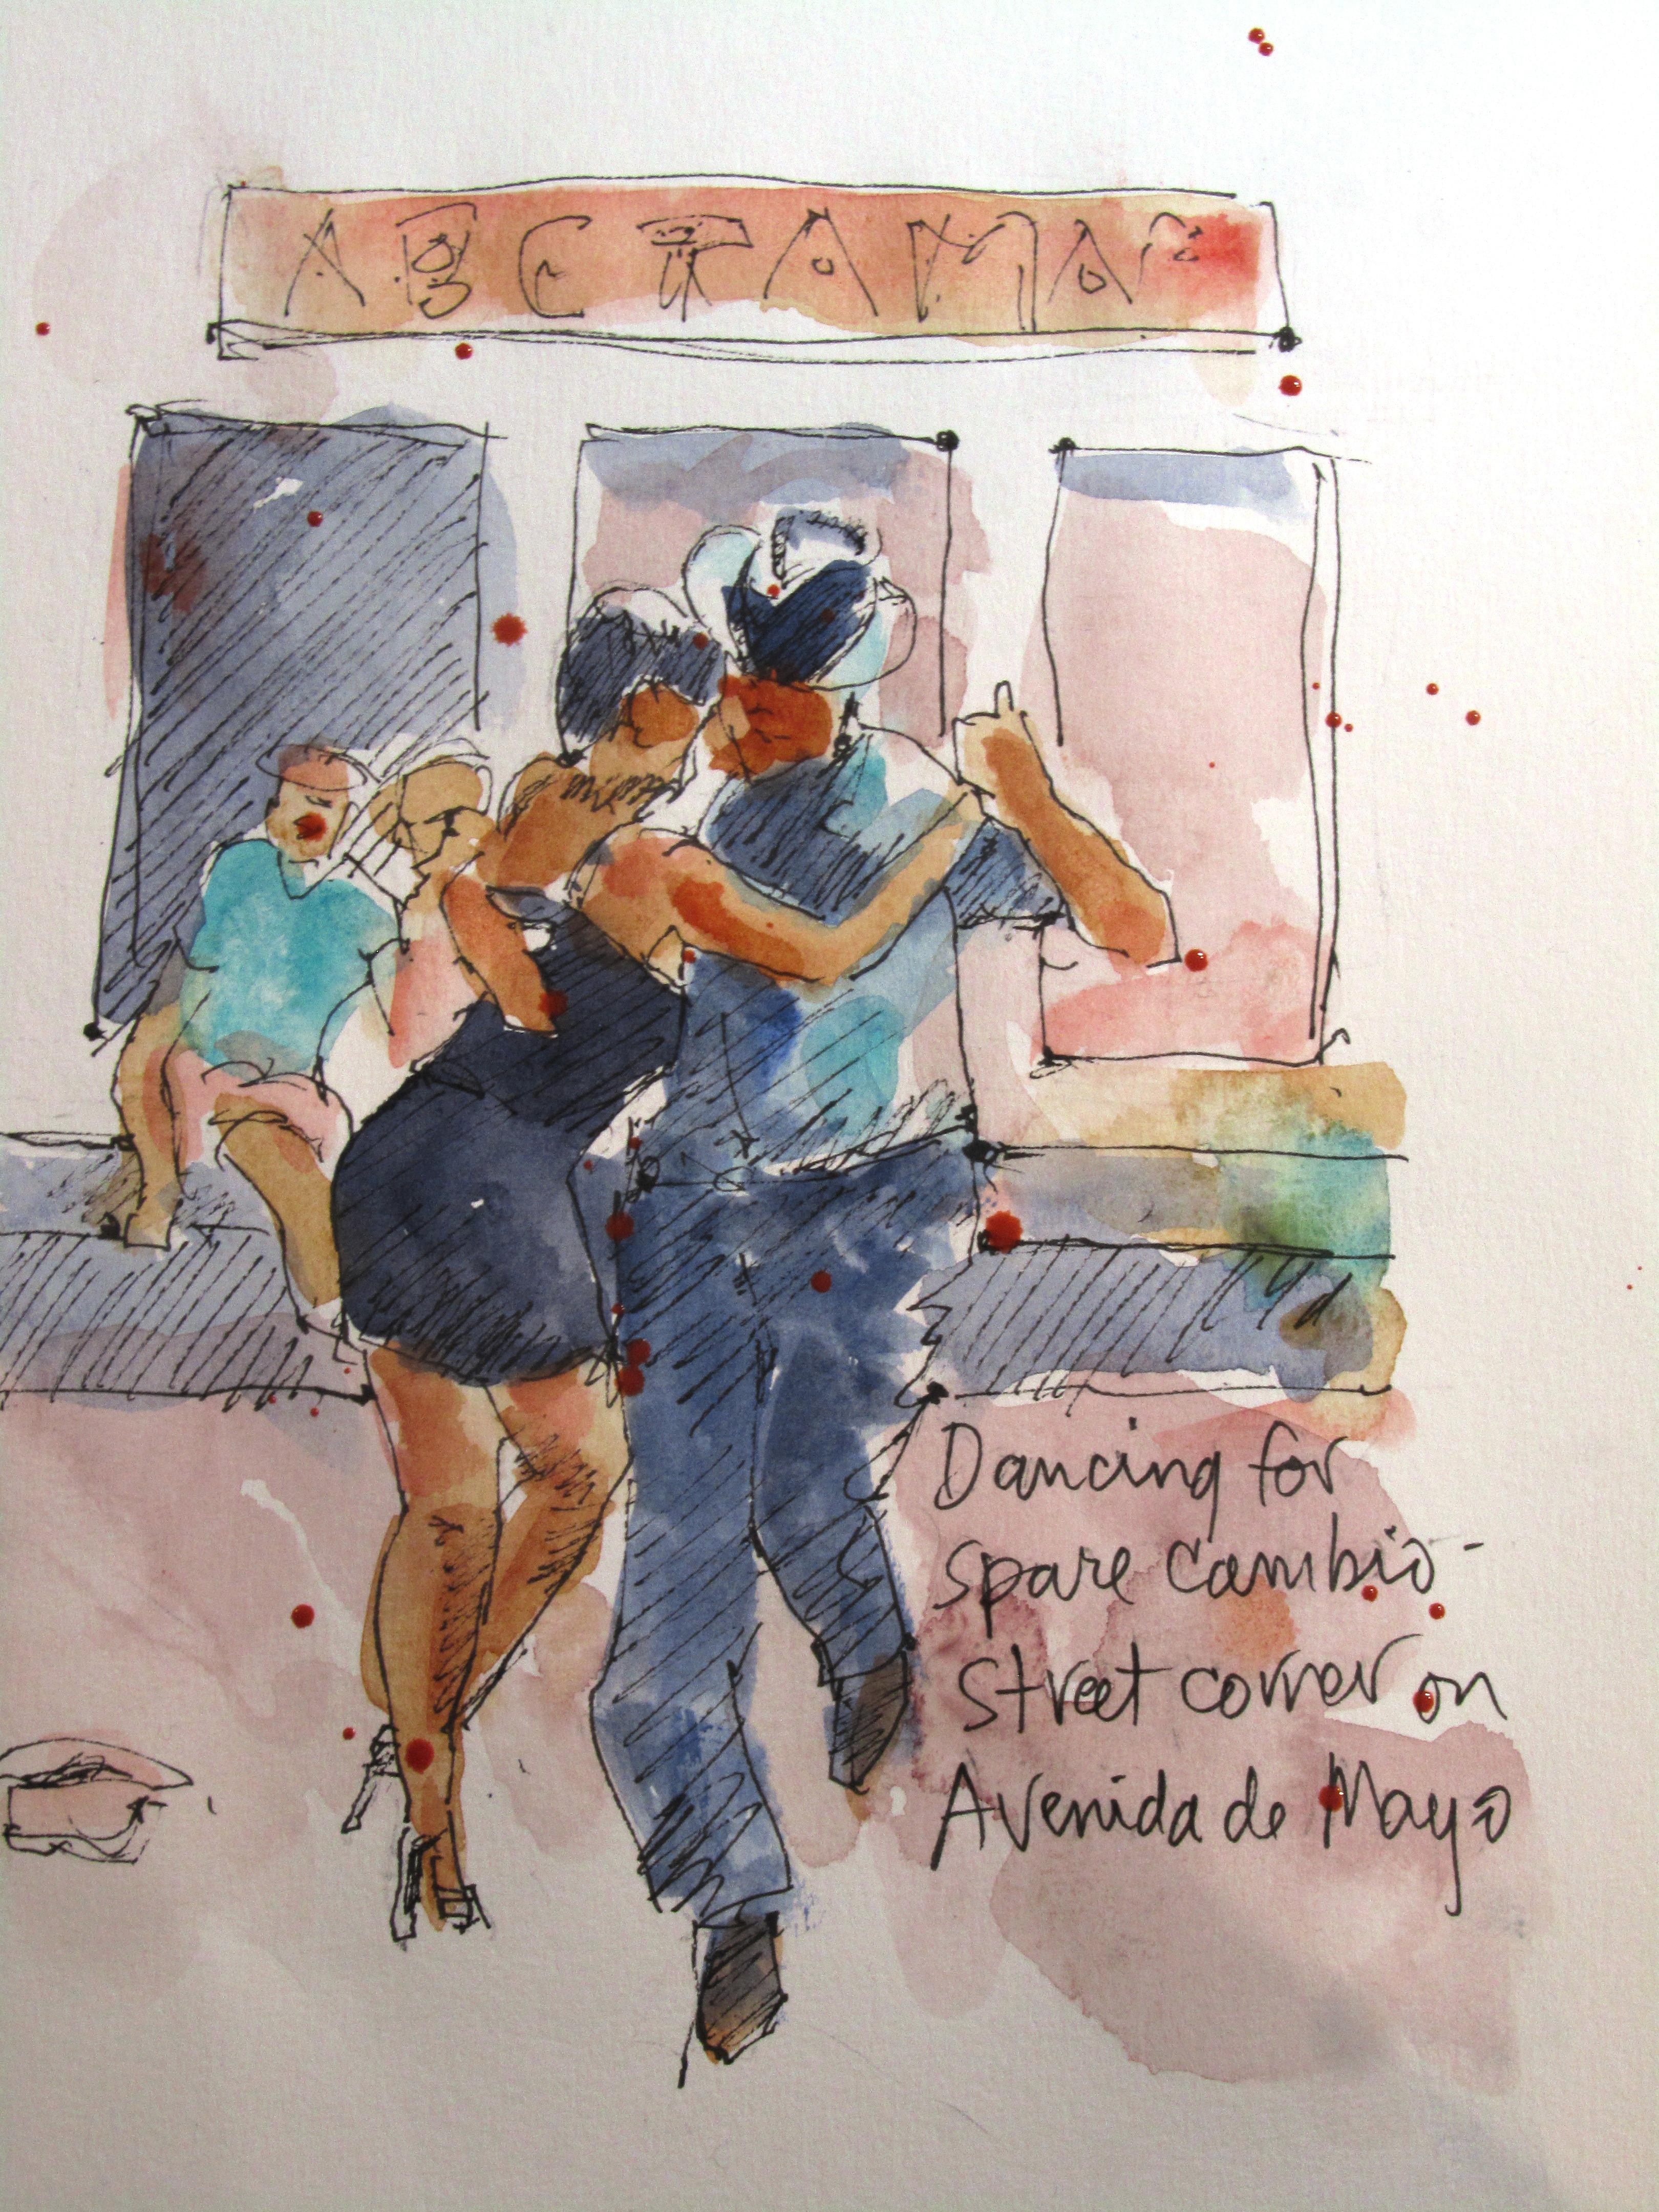 Tango on Av de Mayo